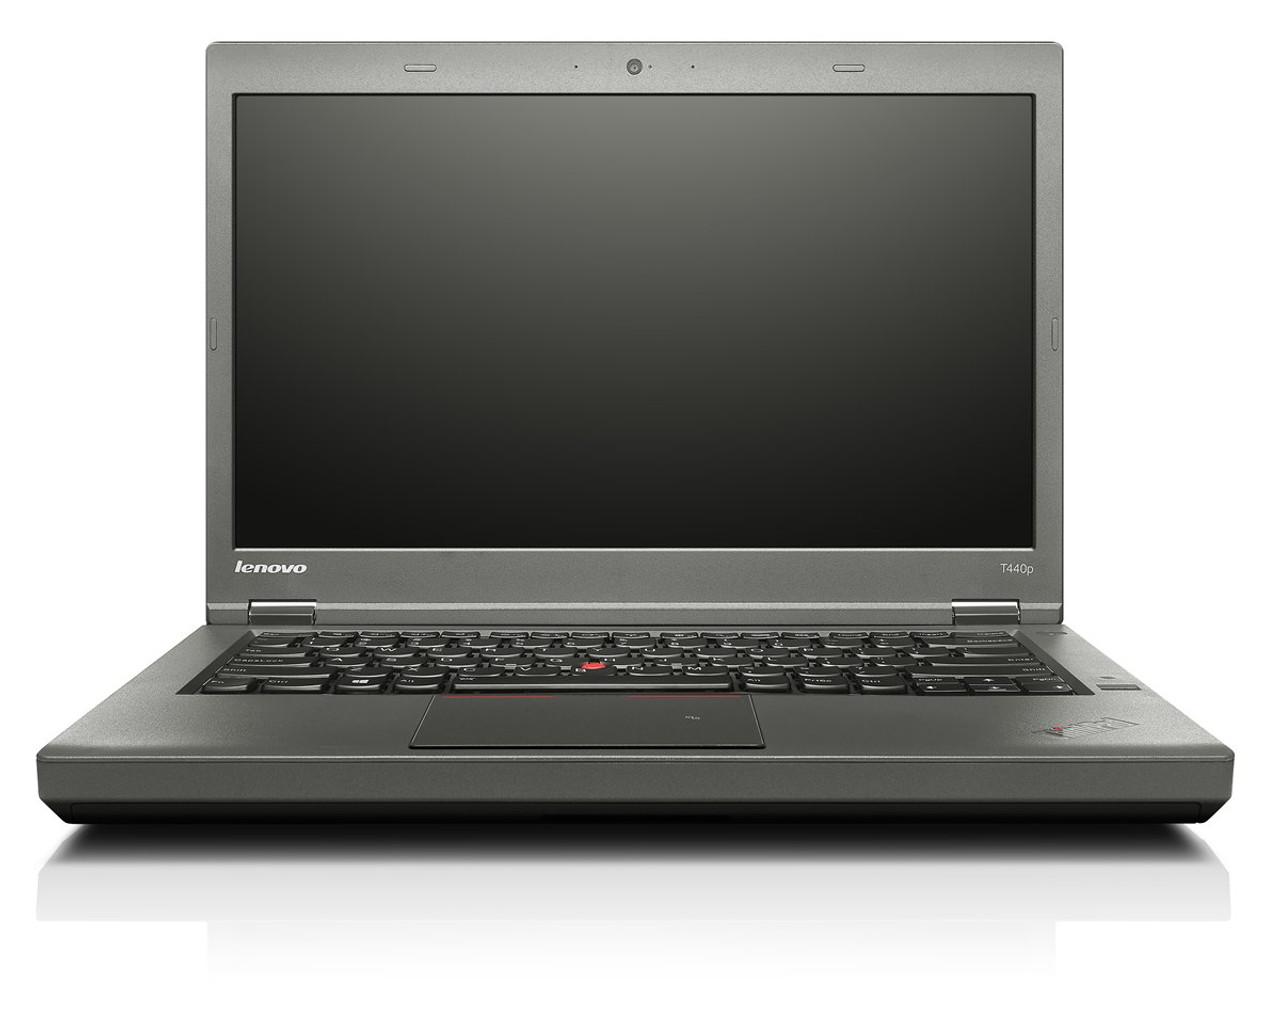 IBM Lenovo Thinkpad T440p Laptop Core i7 2.9GHz, 8GB Ram, 250GB SSD, DVD-RW, Windows 10 Pro 64 Notebook